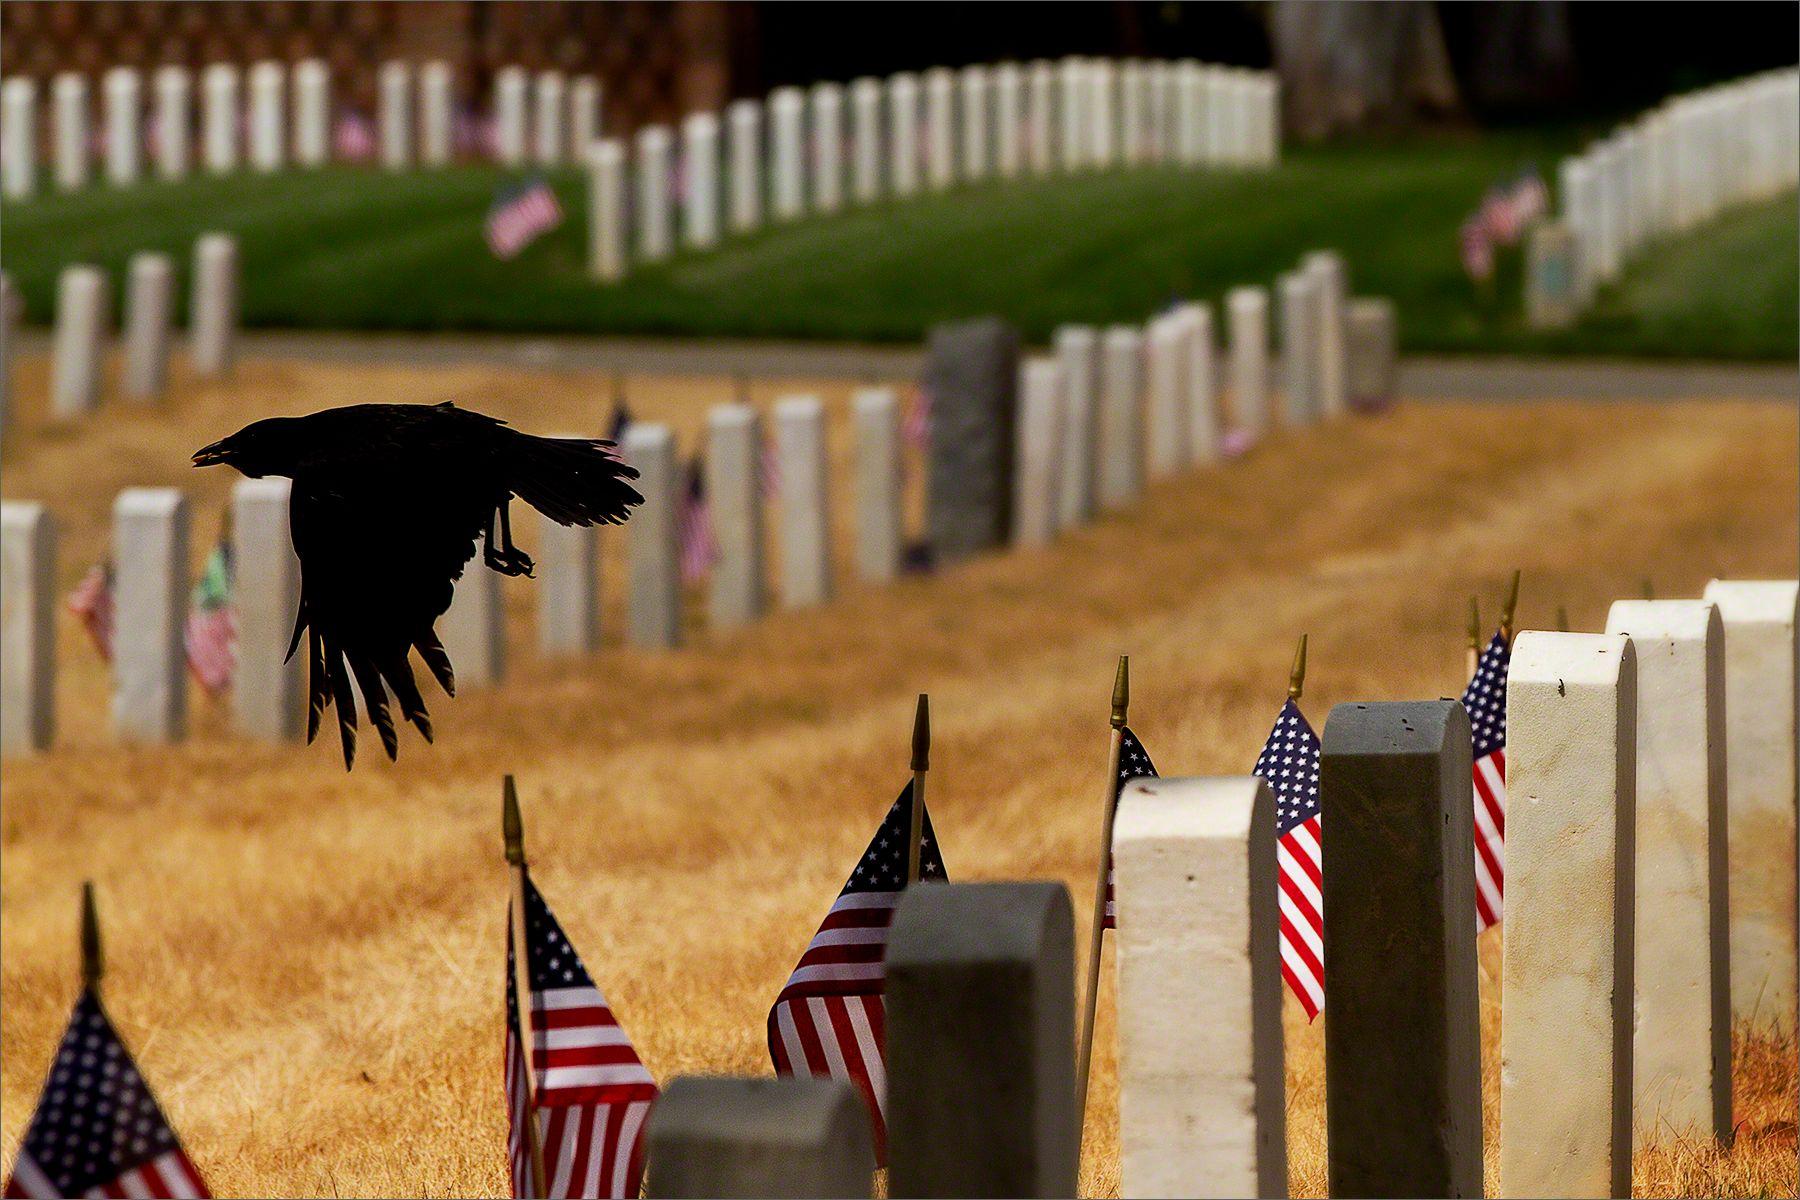 Veteran's Cemetery, Los Angeles